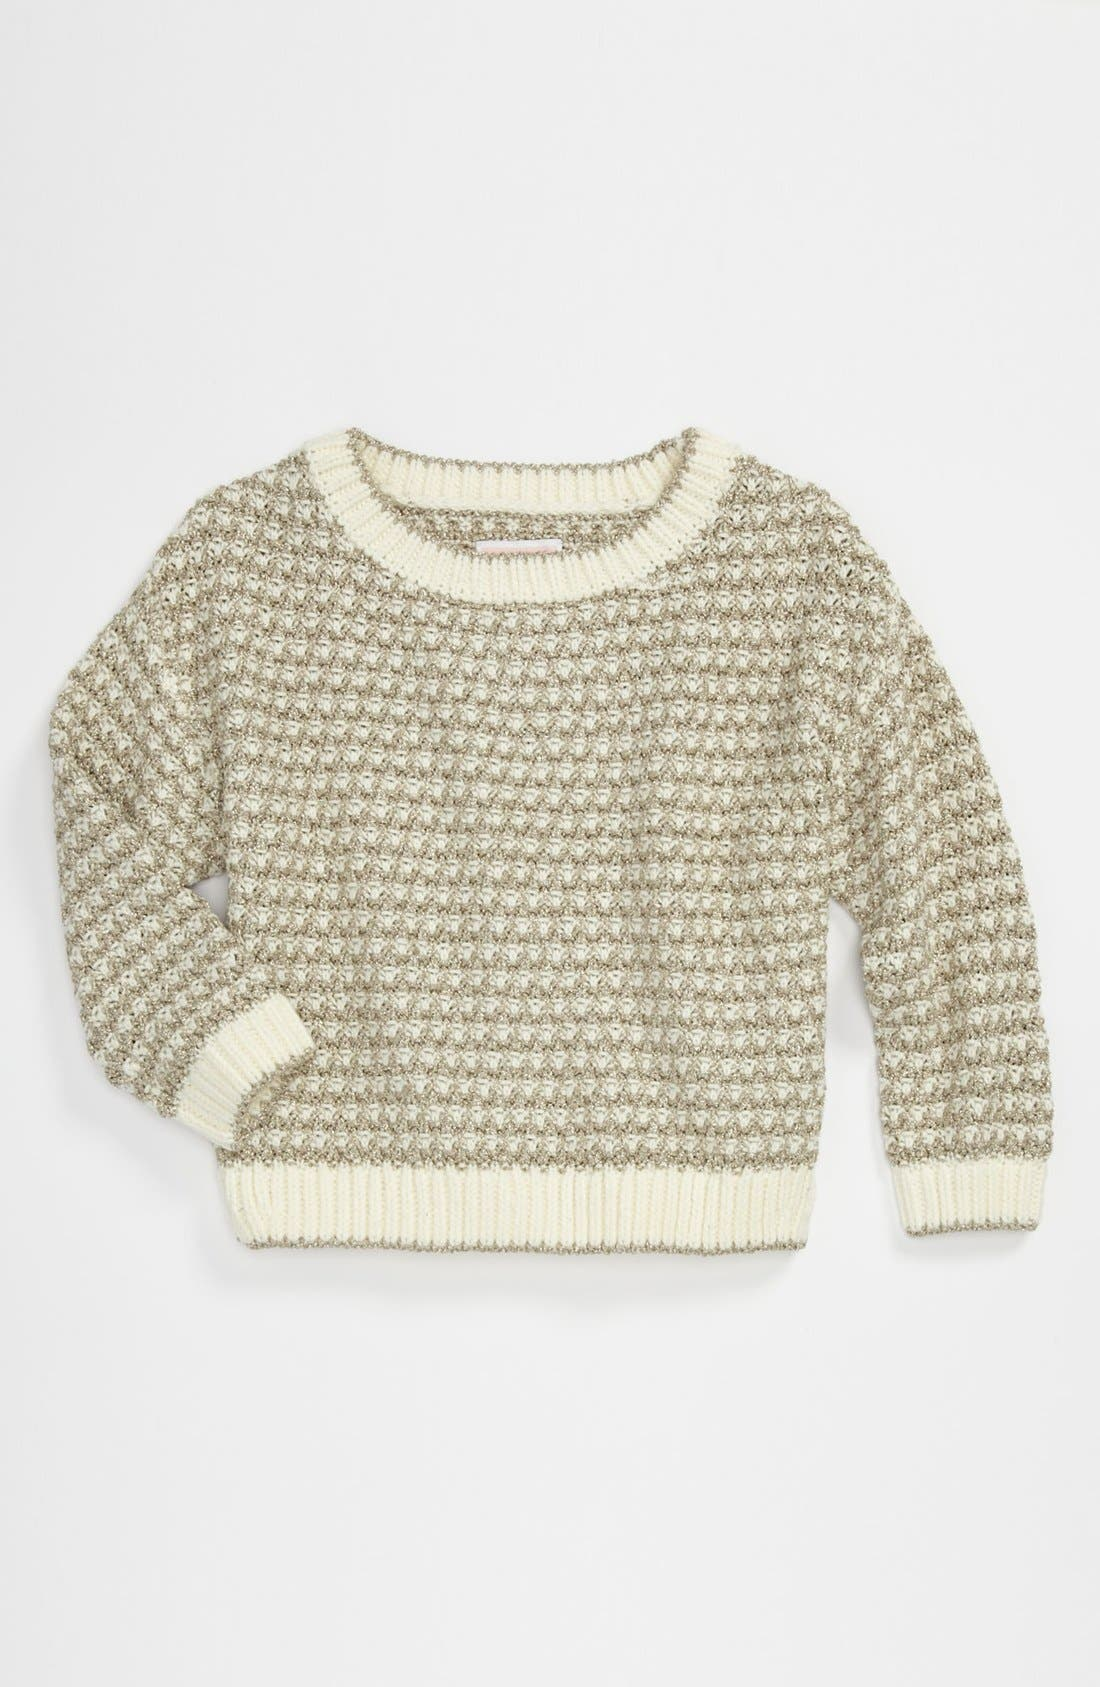 Alternate Image 1 Selected - Juicy Couture Metallic Sweater (Big Girls)